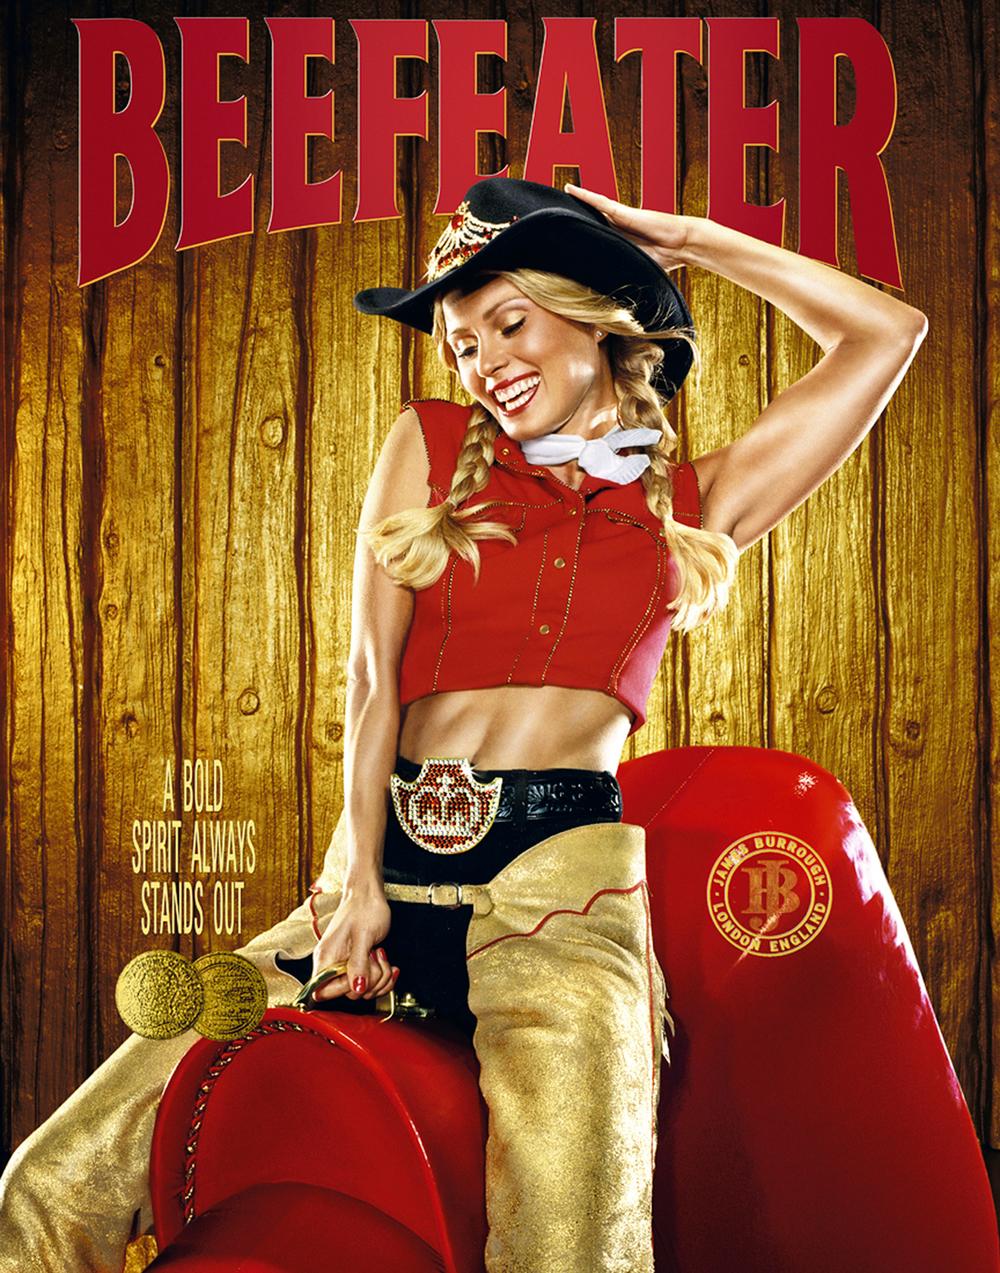 beefeater-bullrider.jpg